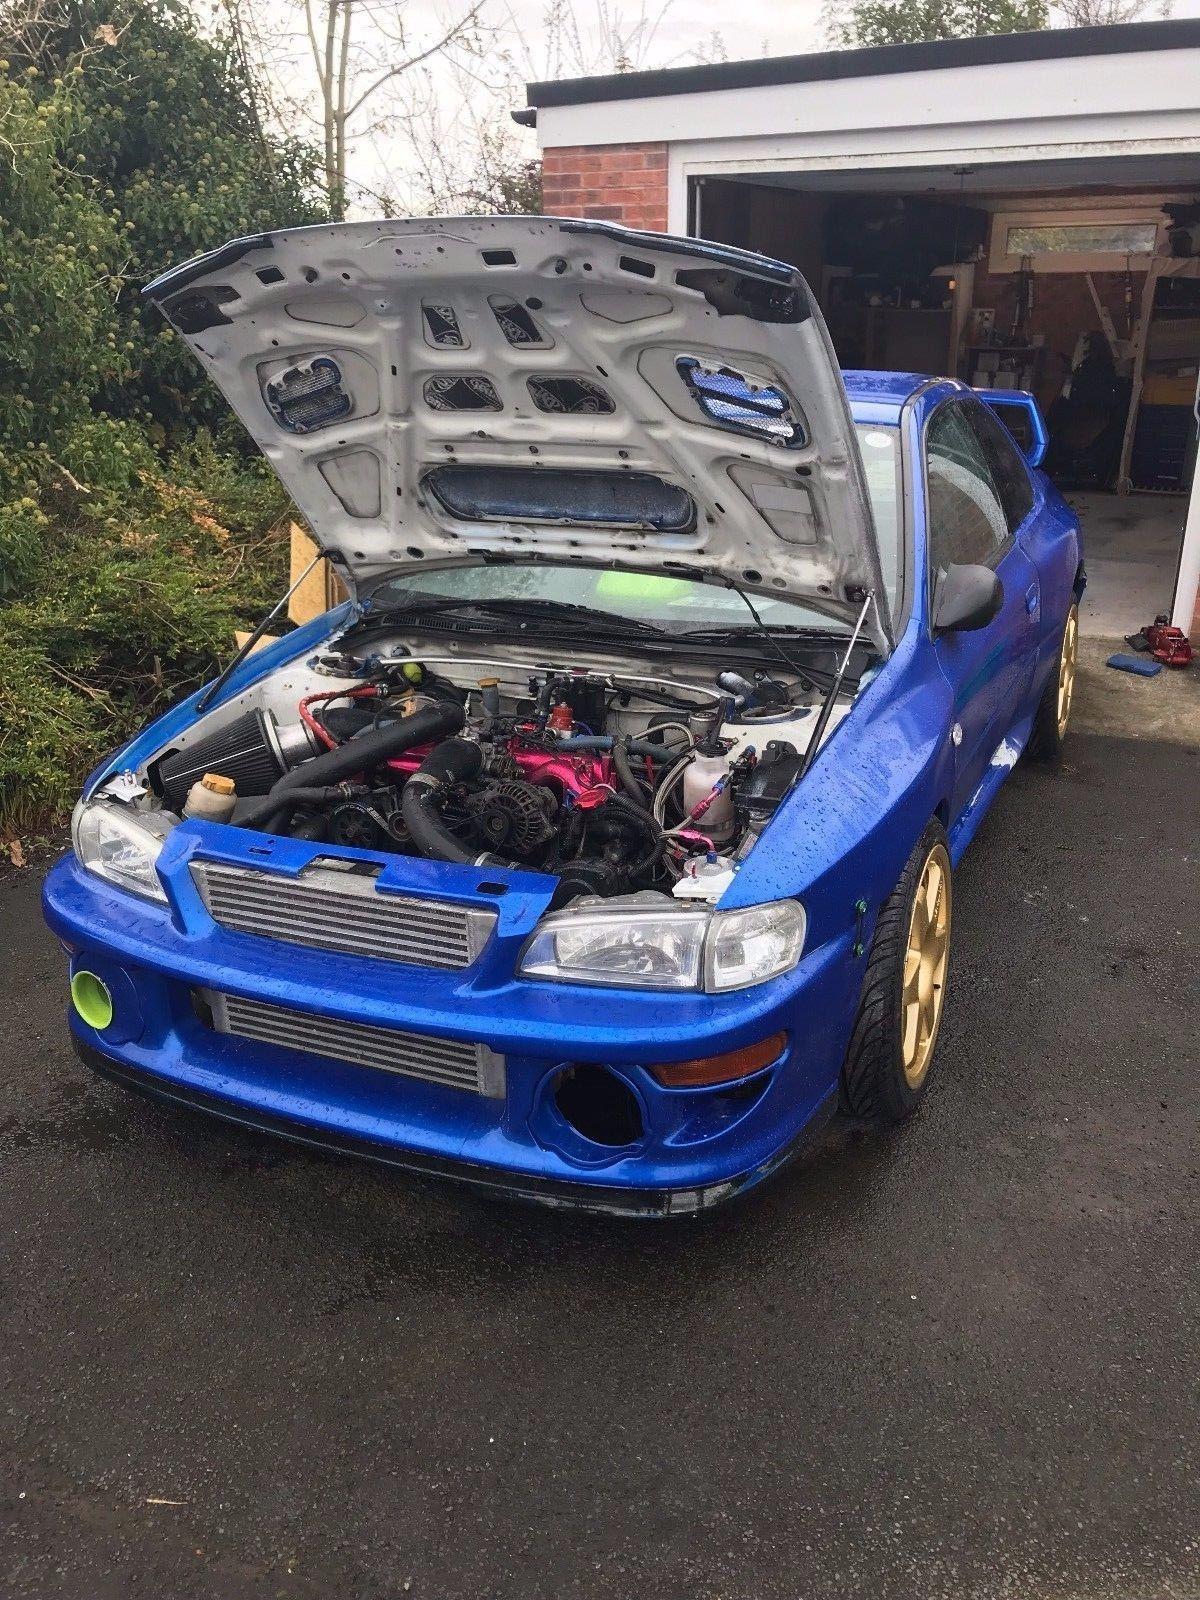 This Subaru Impreza Wrc Wrx Sti Type R Race Car 600bhp Hill Climb Is